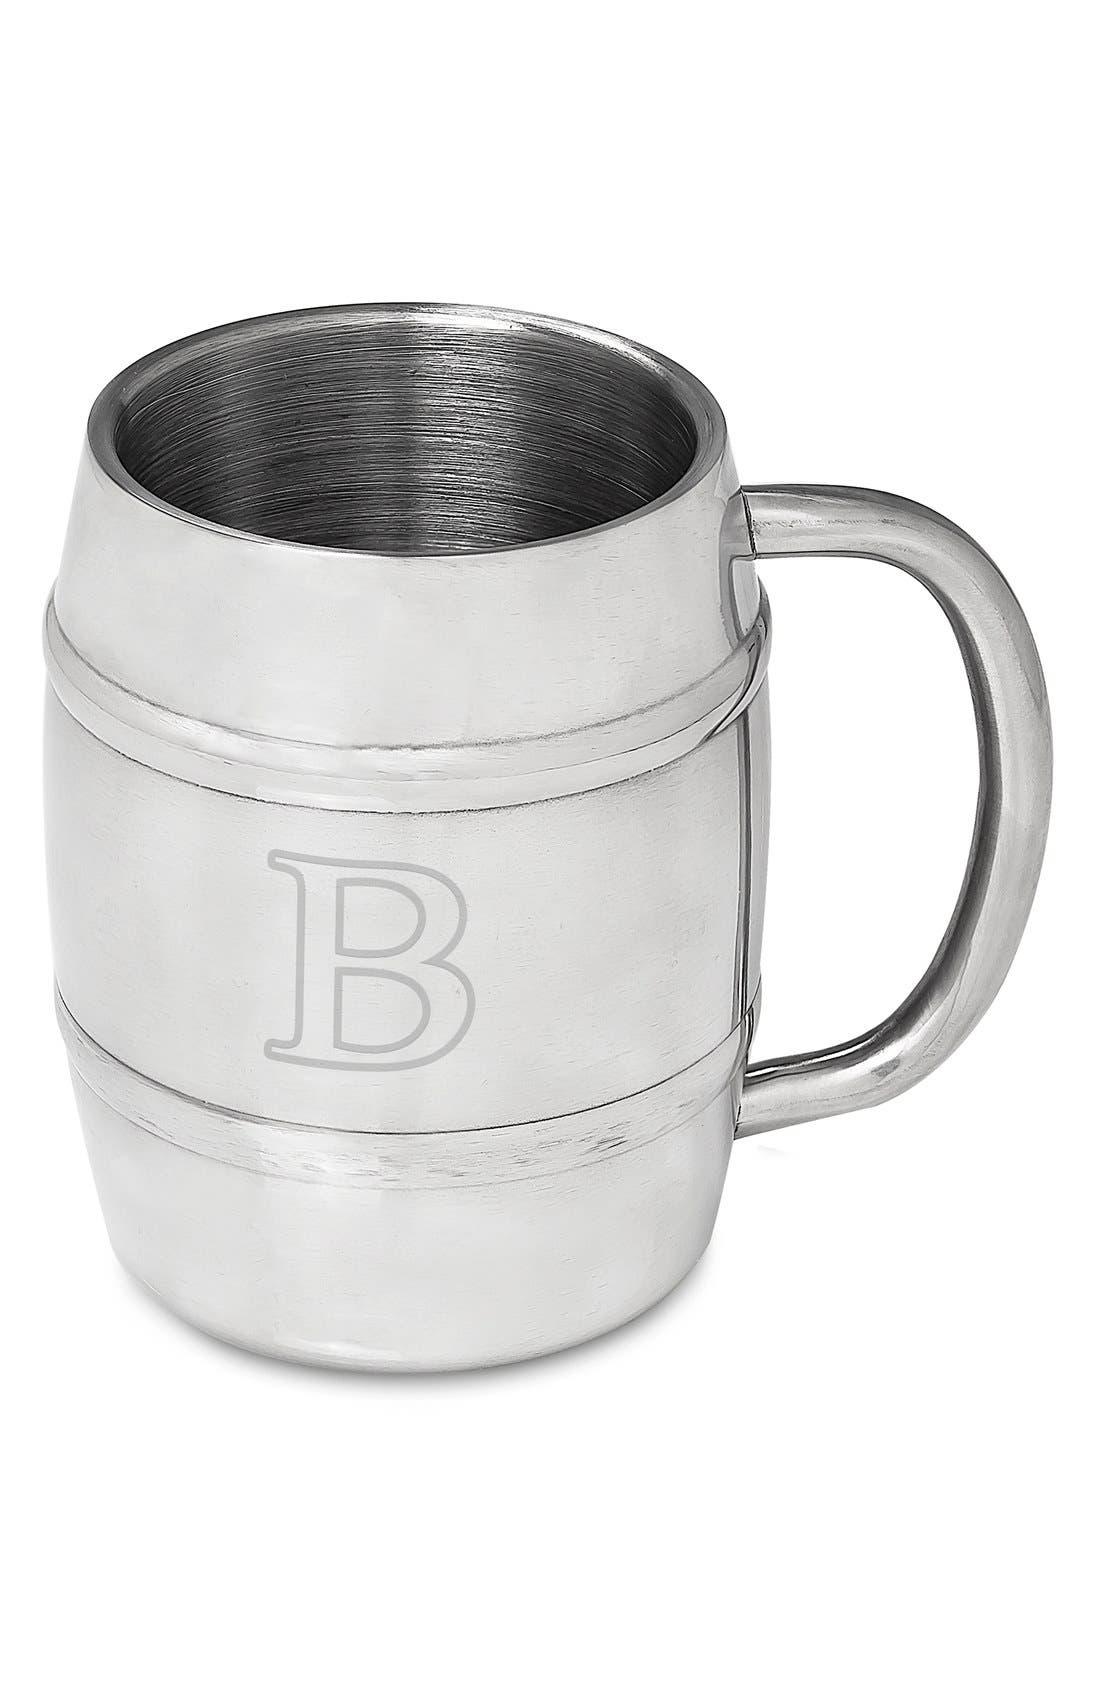 Monogram Stainless Steel Keg Mug,                             Main thumbnail 4, color,